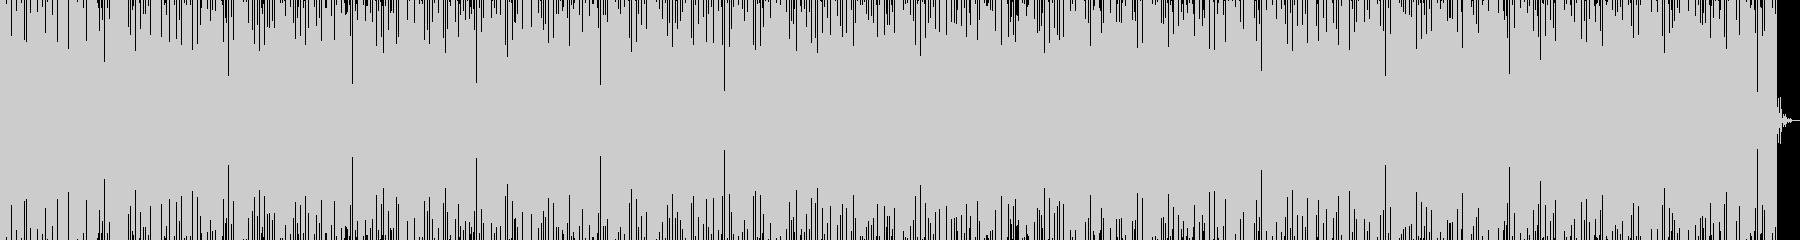 BPM120ハウス報道番組の未再生の波形